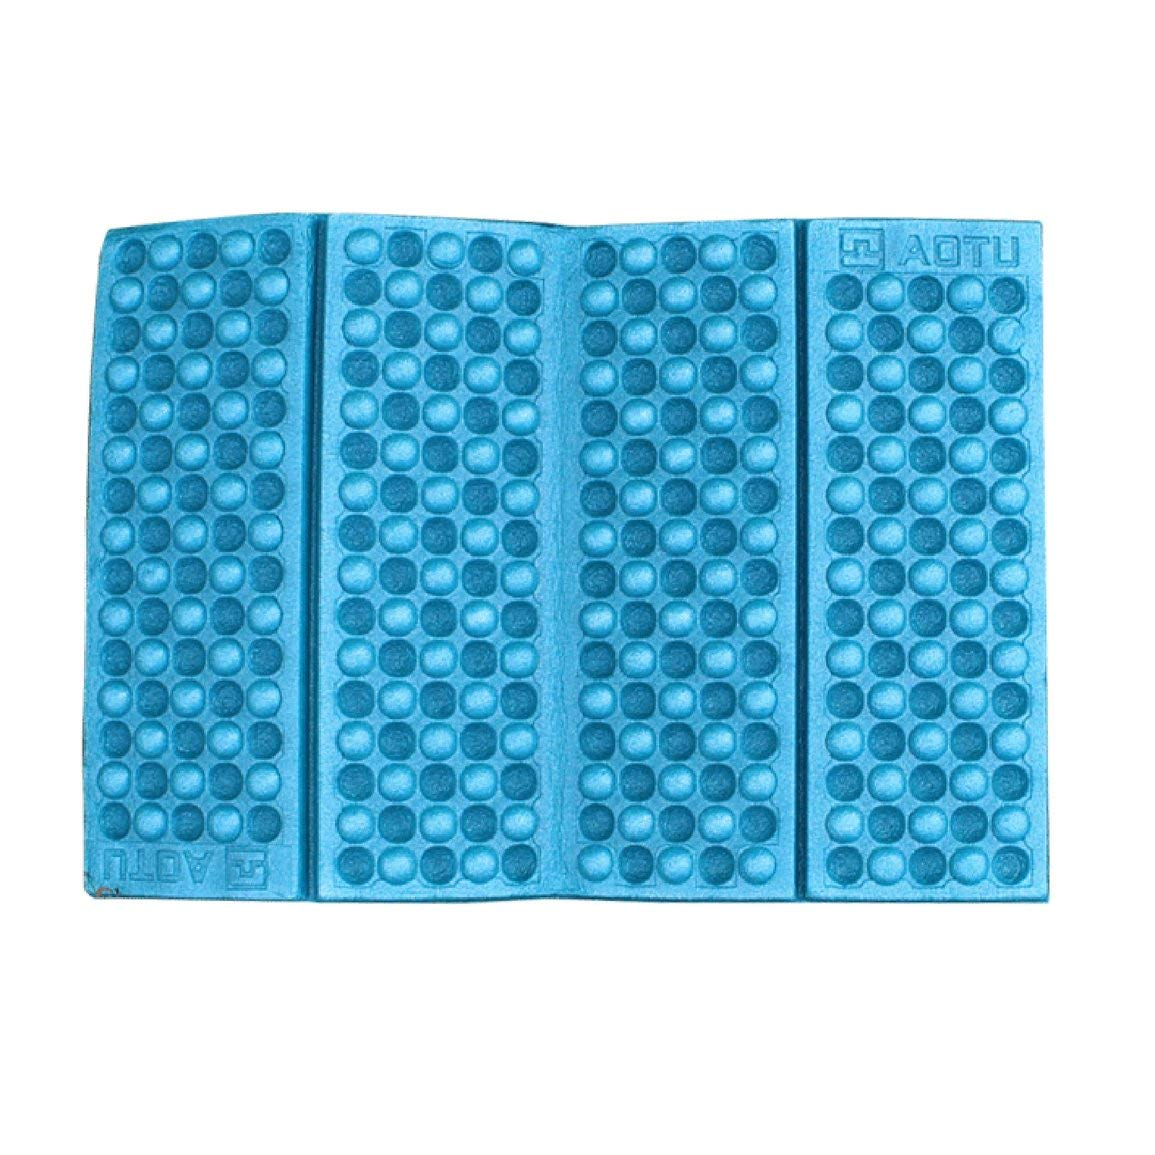 Fantasyworld Outdoor Portable Foldable EVA Foam Mat Waterproof Moisture-Proof Cushion Seat Pad for Hiking Camping Travel Honeycomb Mat